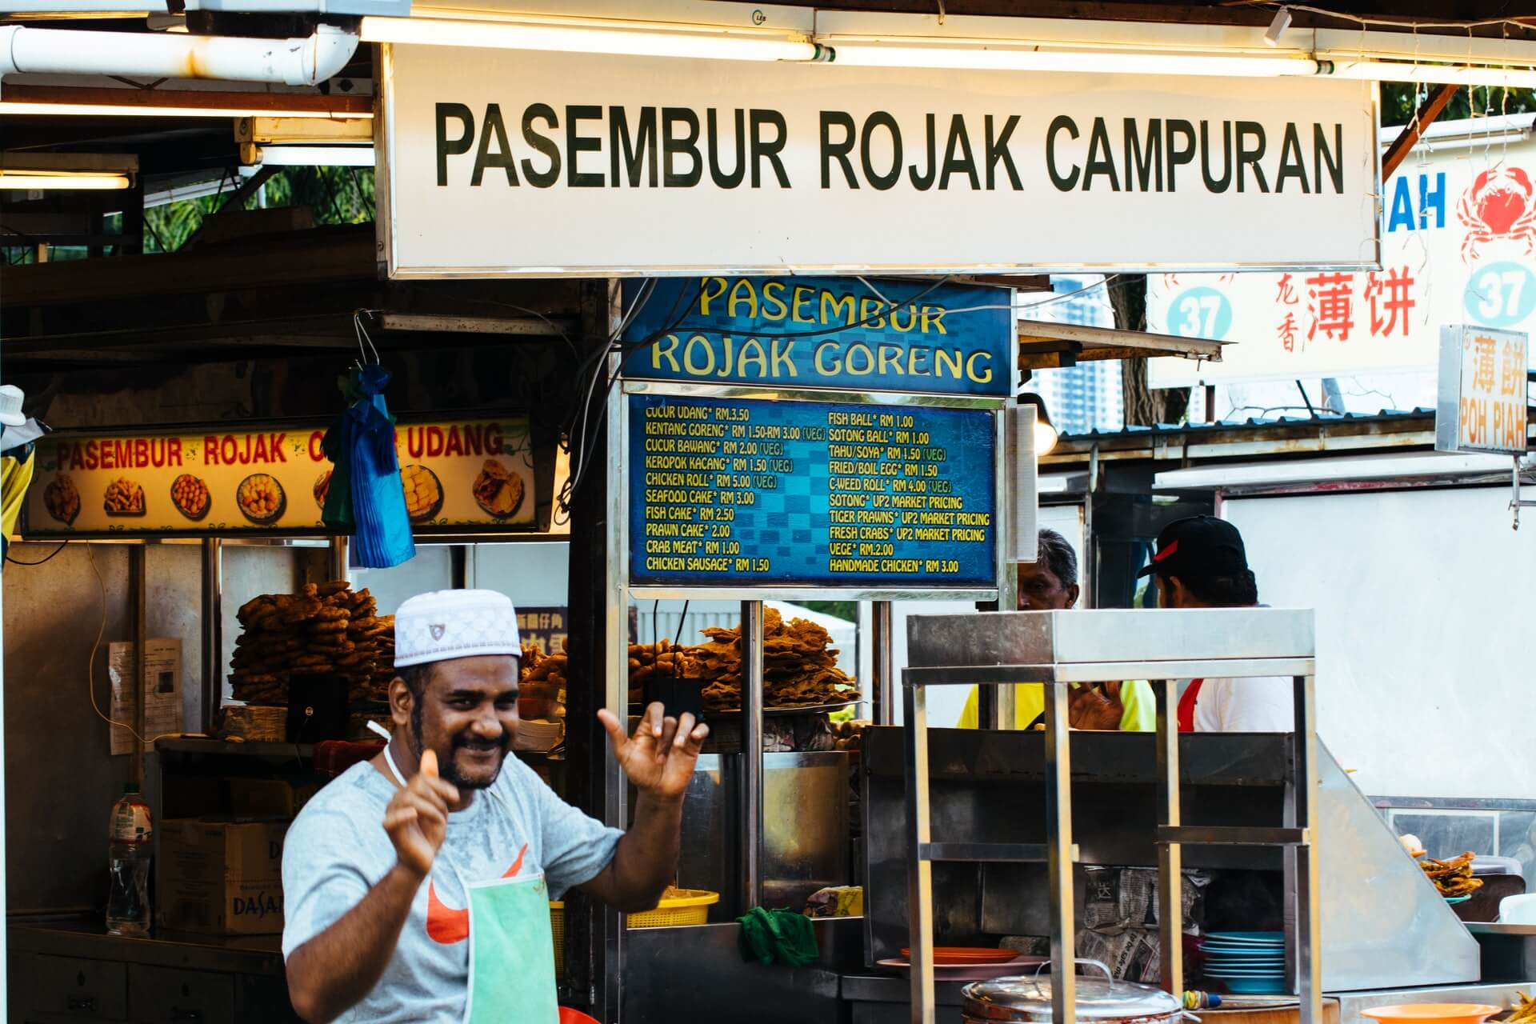 A man serving street food goreng in Kuala Lumpur, Malaysia